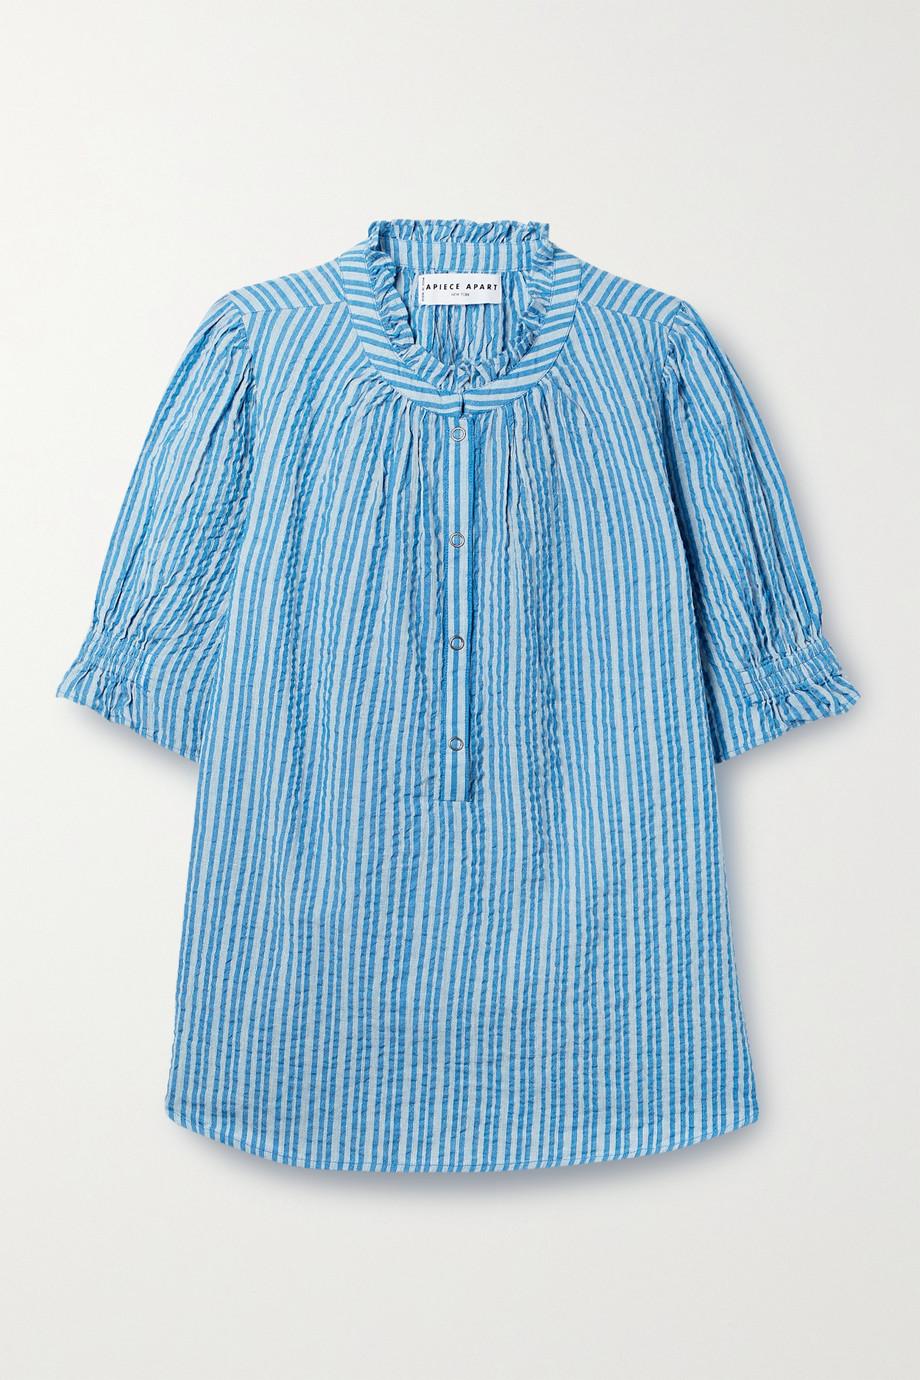 APIECE APART Los Altos ruffled striped organic cotton-seersucker blouse